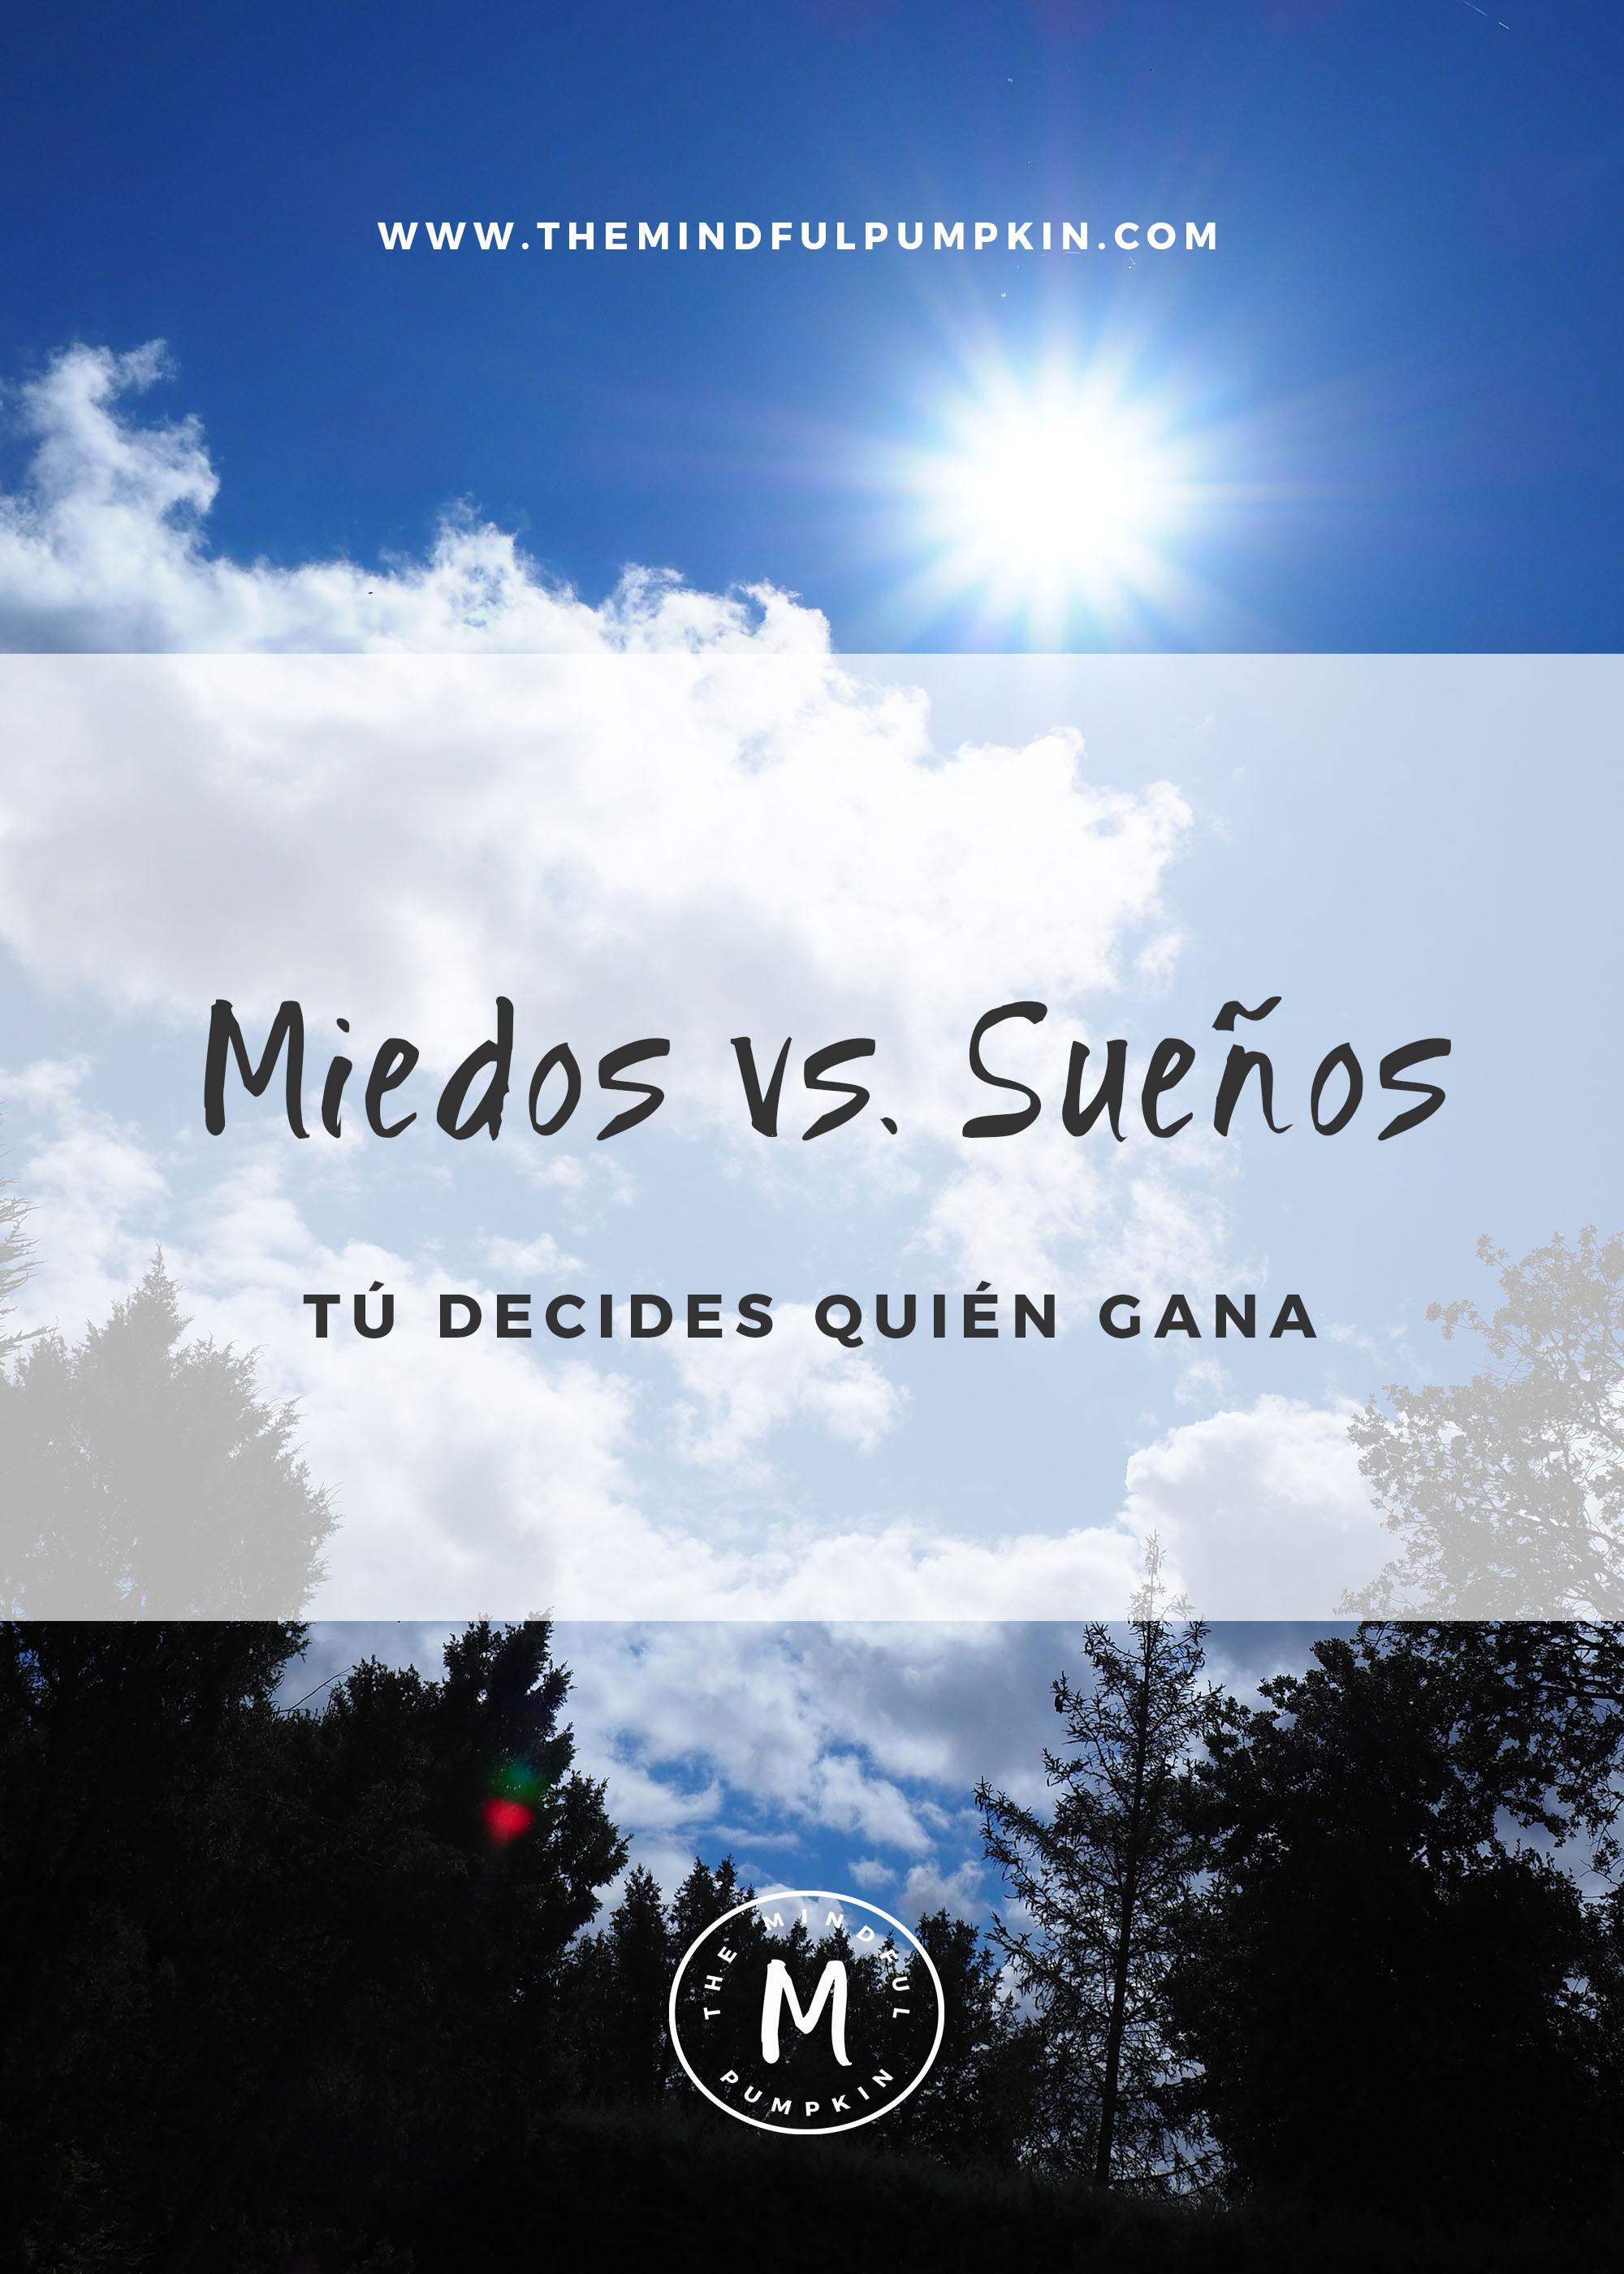 Mieods vs Sueños Blog Header.jpg